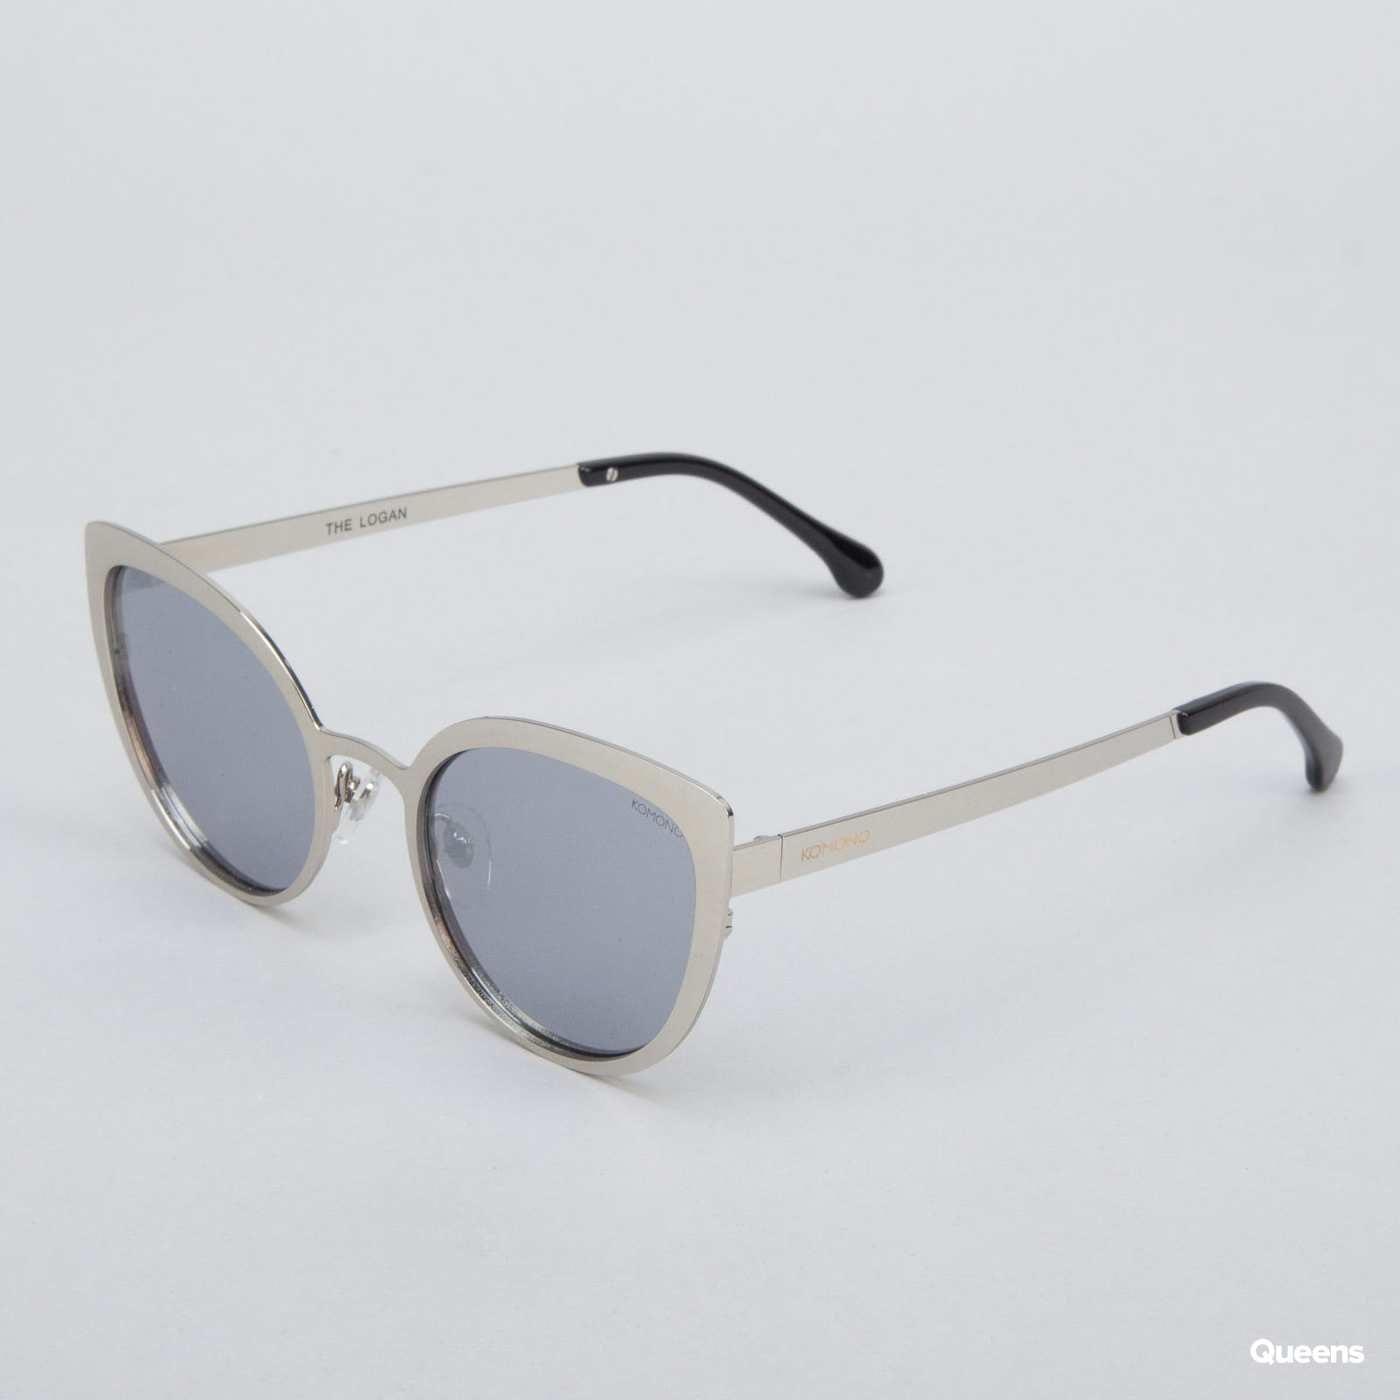 Sluneční brýle Komono Logan – Queens 💚 38b050f19bb